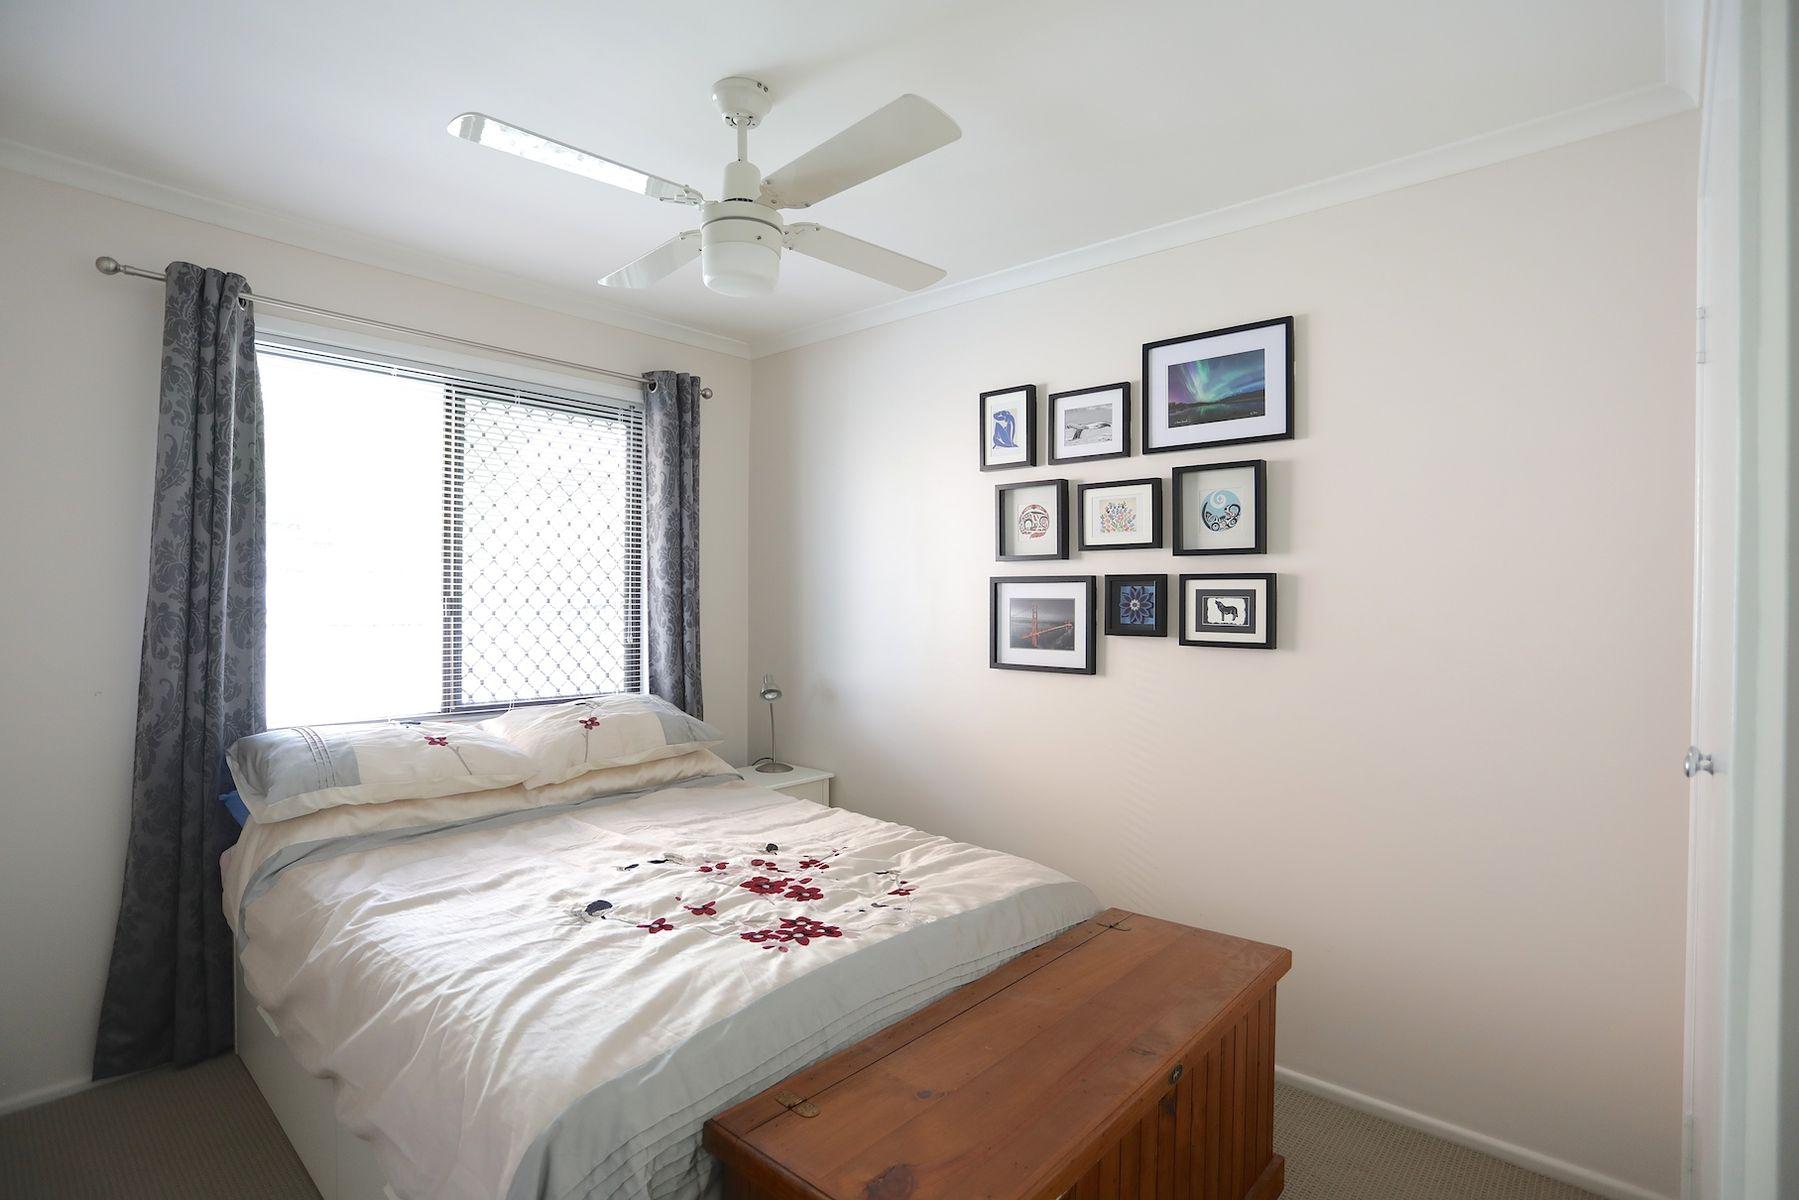 17/10 Palara Street, Rochedale South, QLD 4123